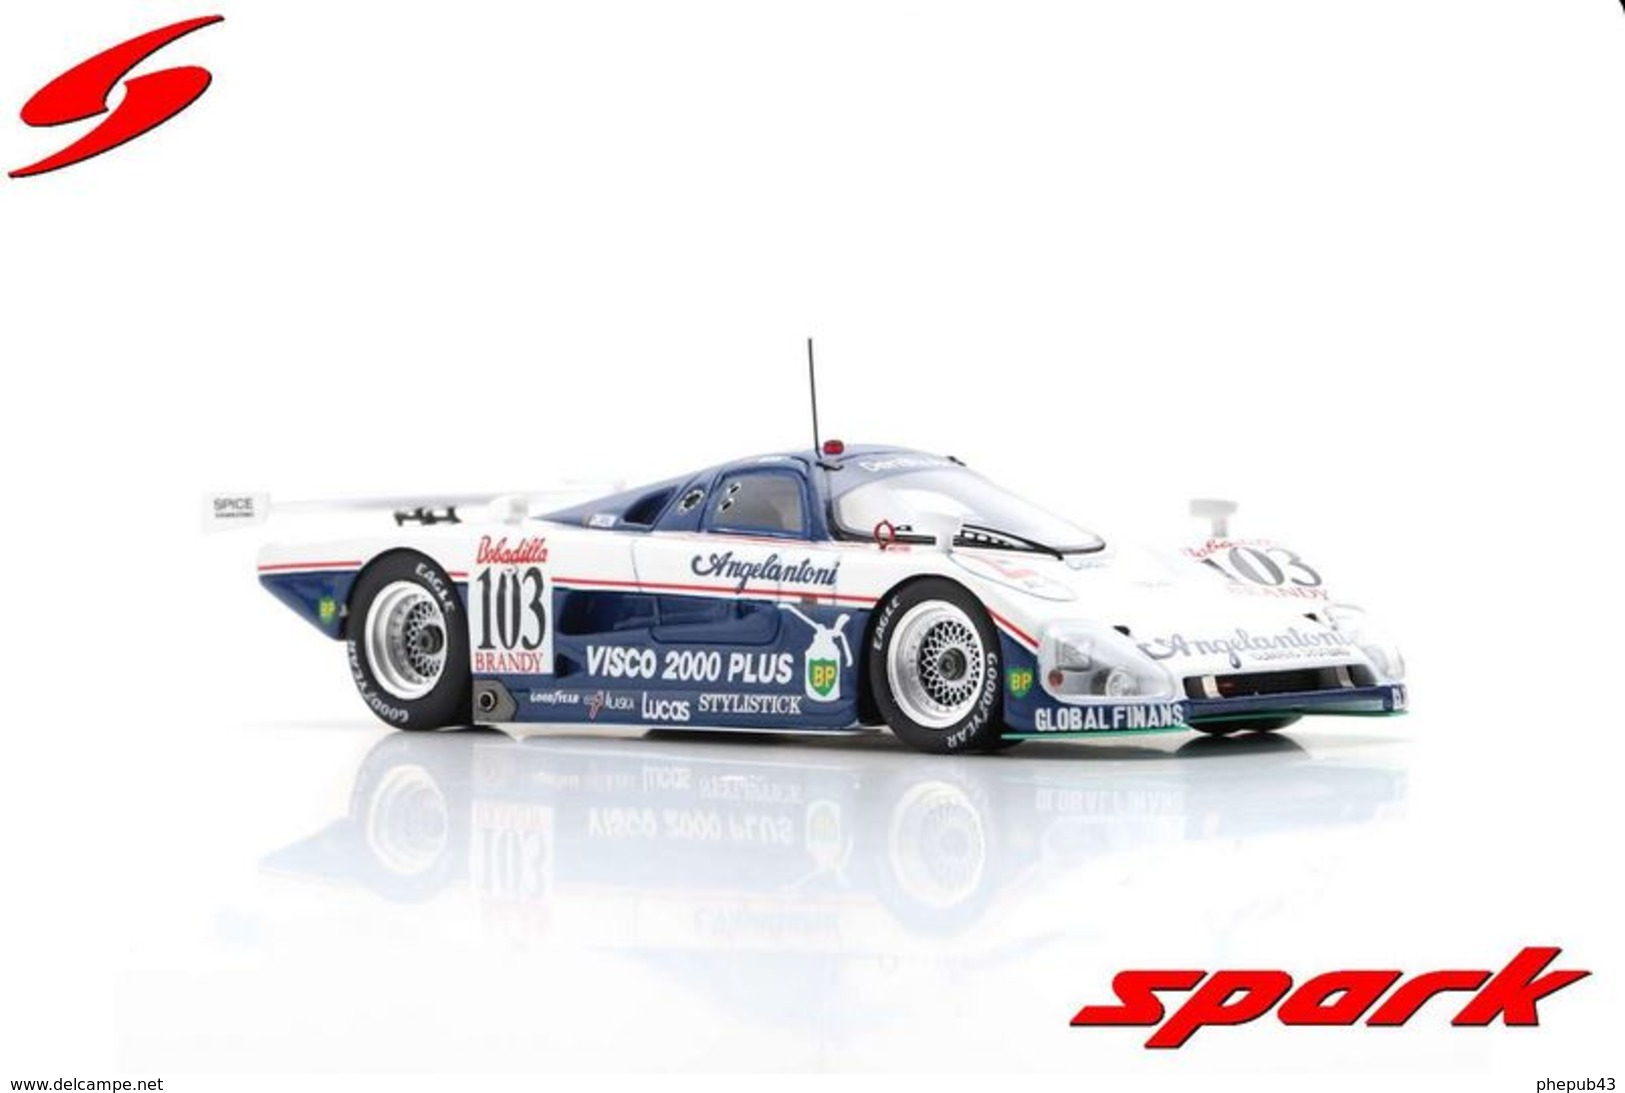 Spice SE 88 C - A. Coppelli/T. Thyrring/E. Salazar - 24H Le Mans 1988 #103 - Spark - Spark